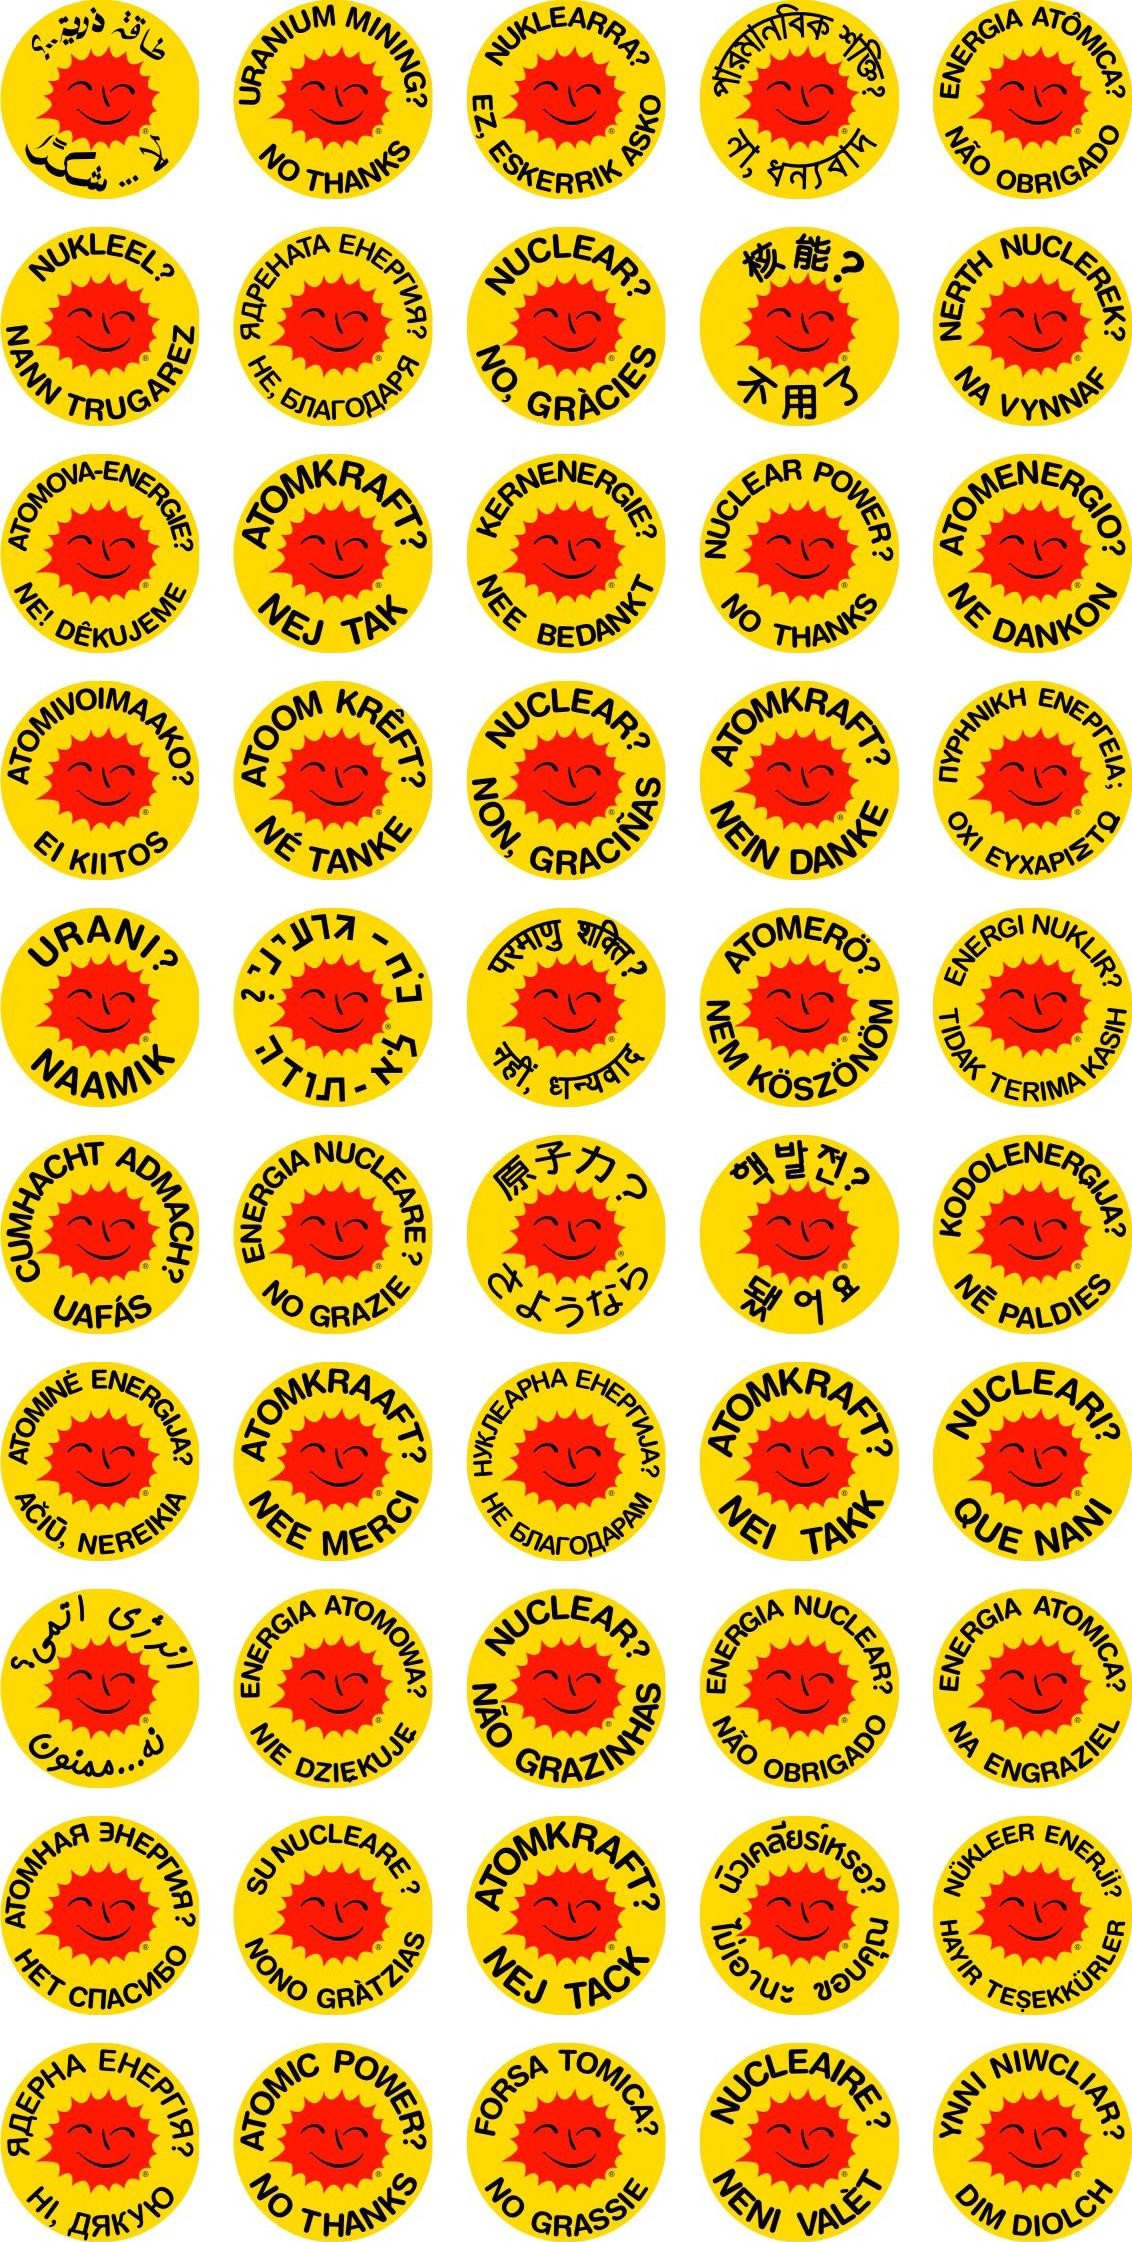 Pin By Roshanmenon On 2018 Smiling Sun Photoshop Design Design